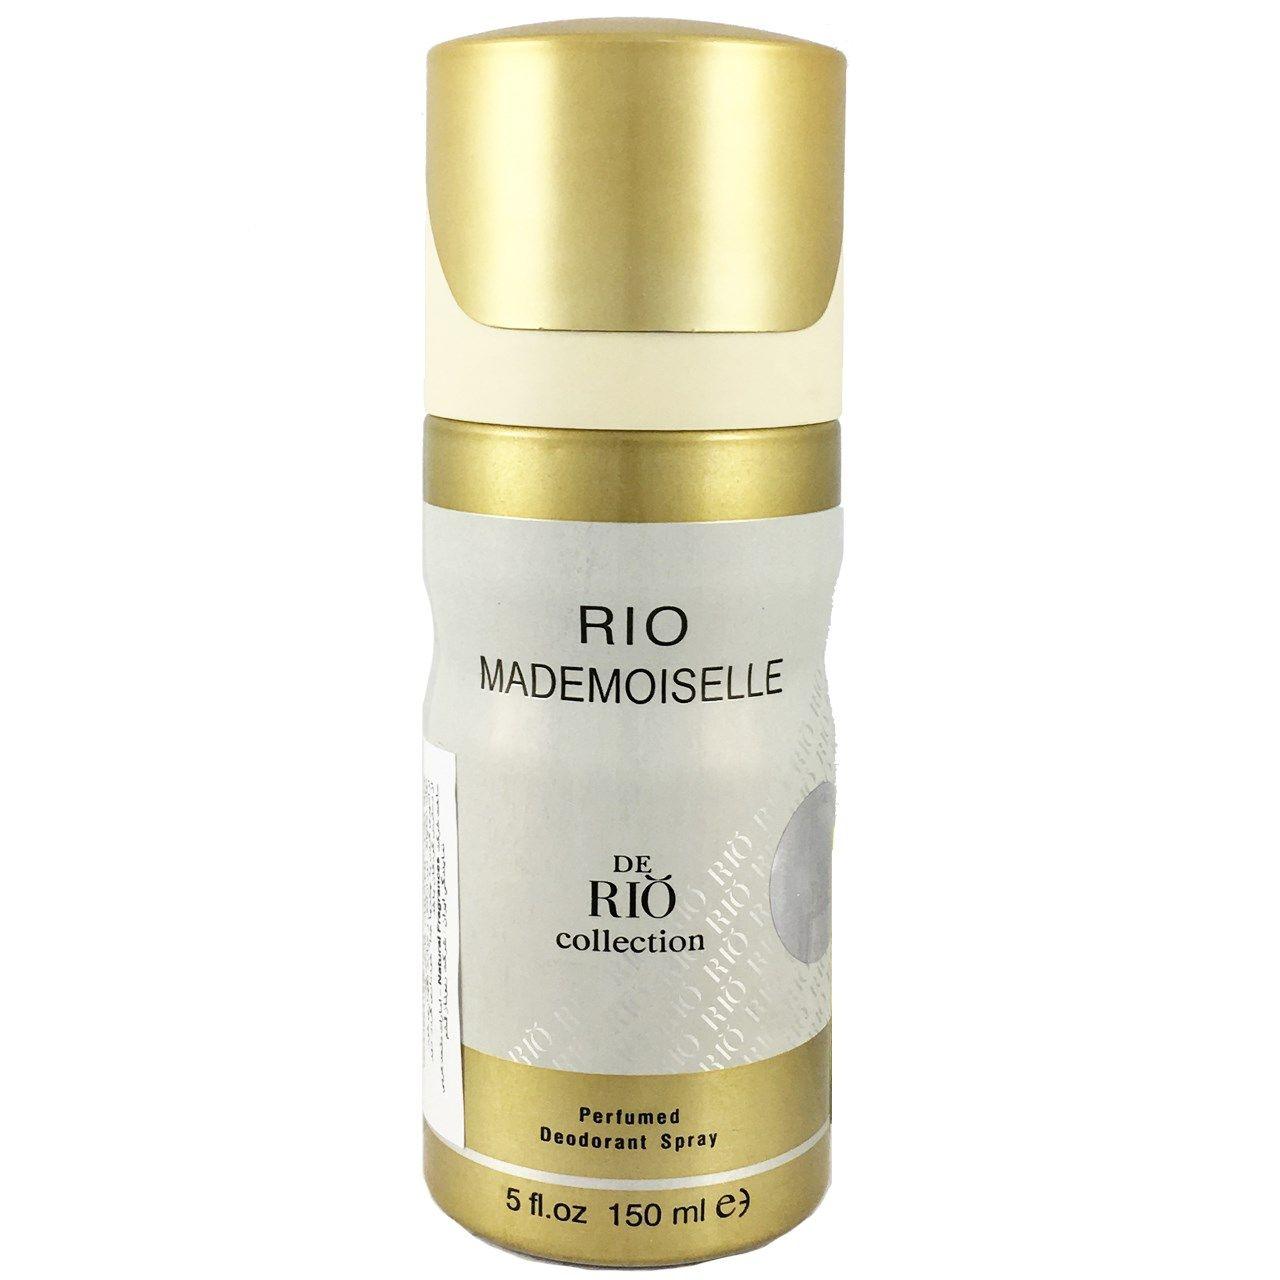 اسپری ضد تعریق زنانه ریو کالکشن مدل Rio Mademoiselle حجم 150ml -  - 1